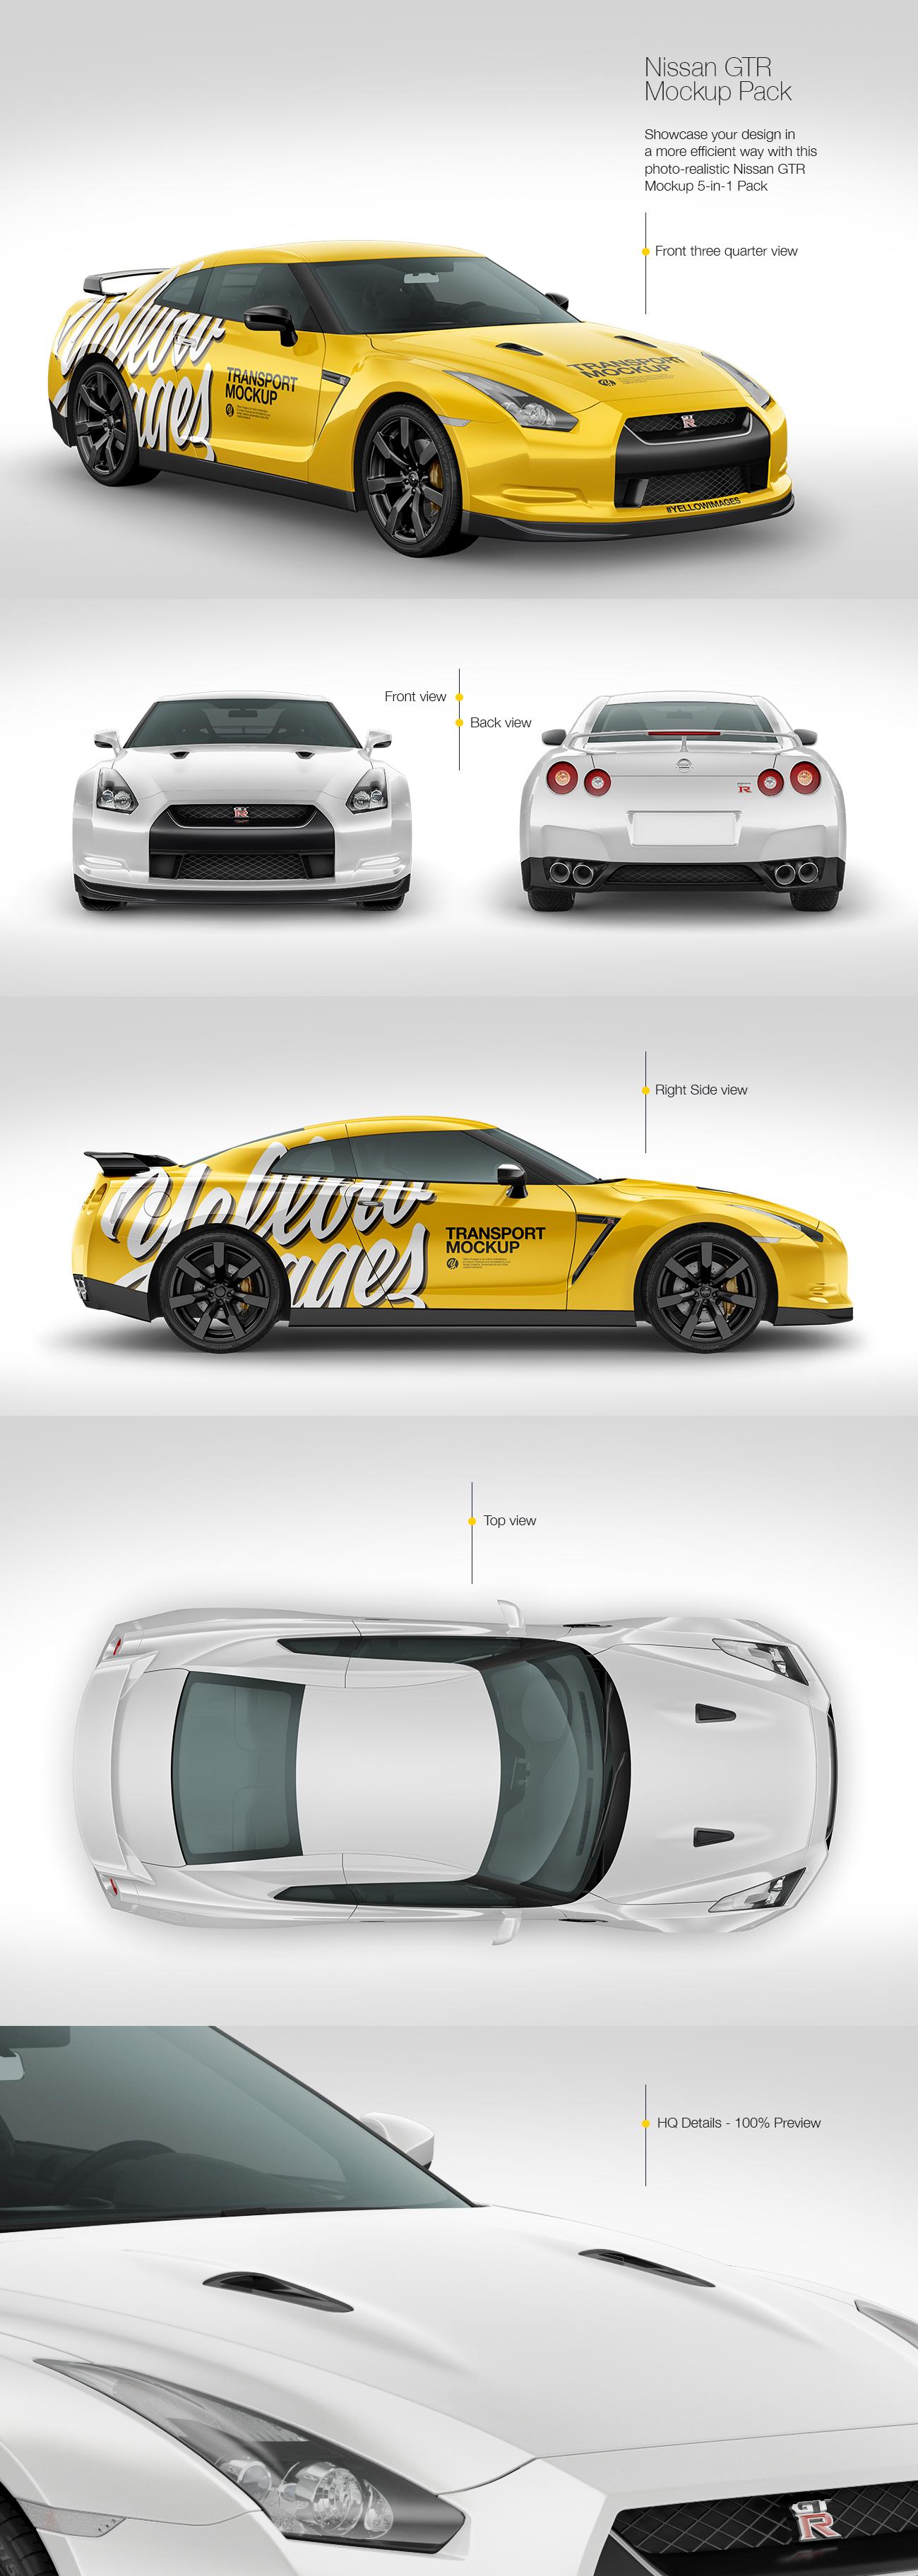 Nissan GTR Mockup Pack